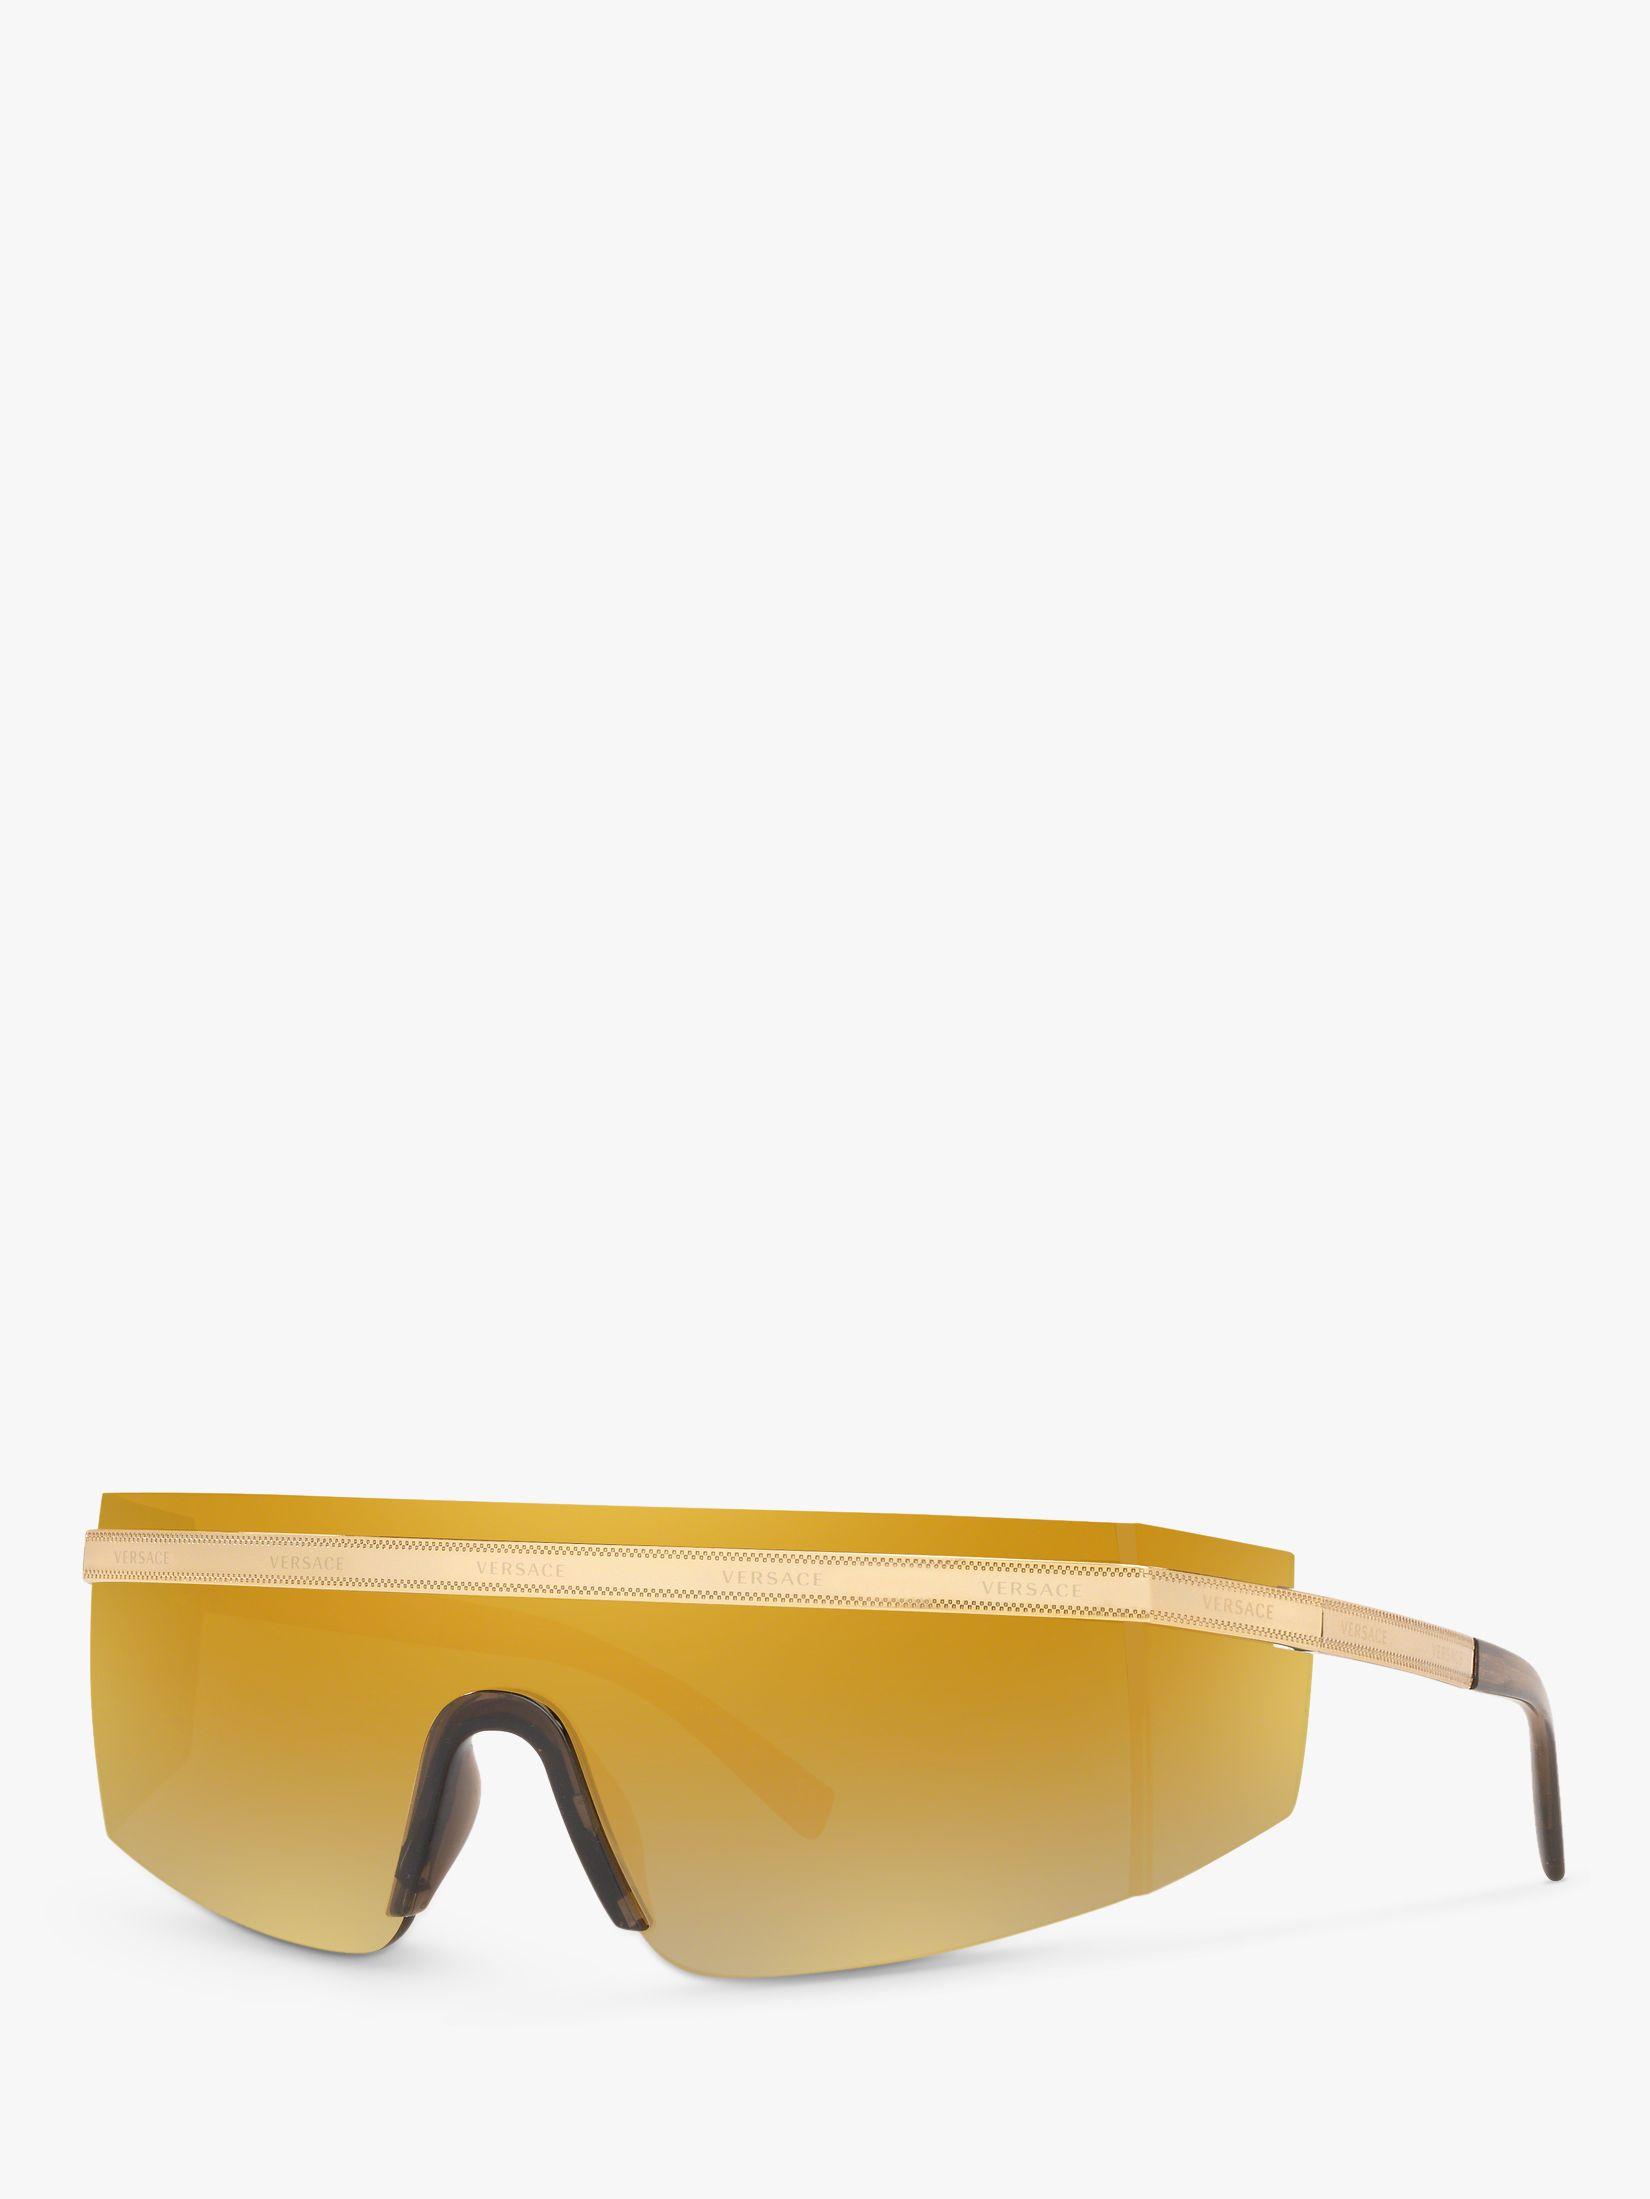 Versace Versace VE2208 Unisex Rectangular Wrap Sunglasses